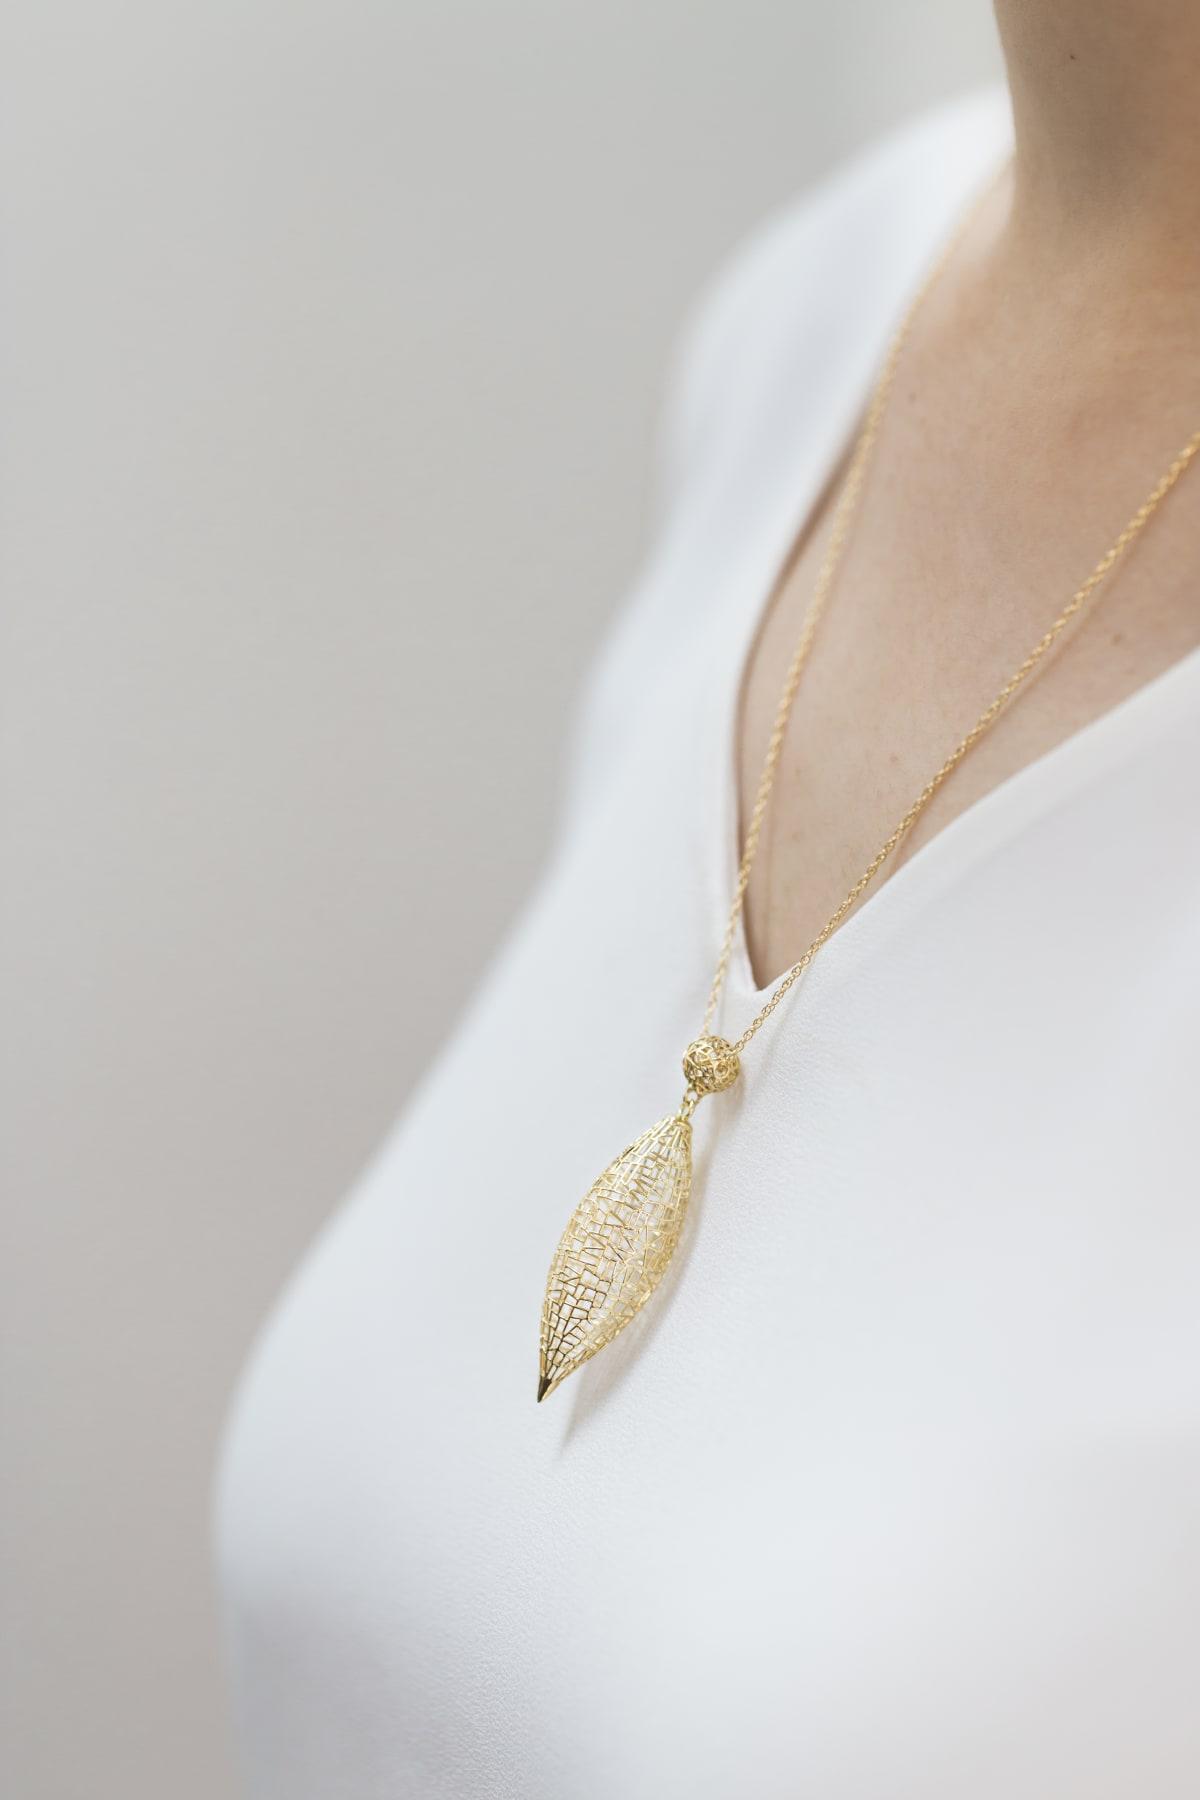 Baiyang Qiu's Fine Jewelry